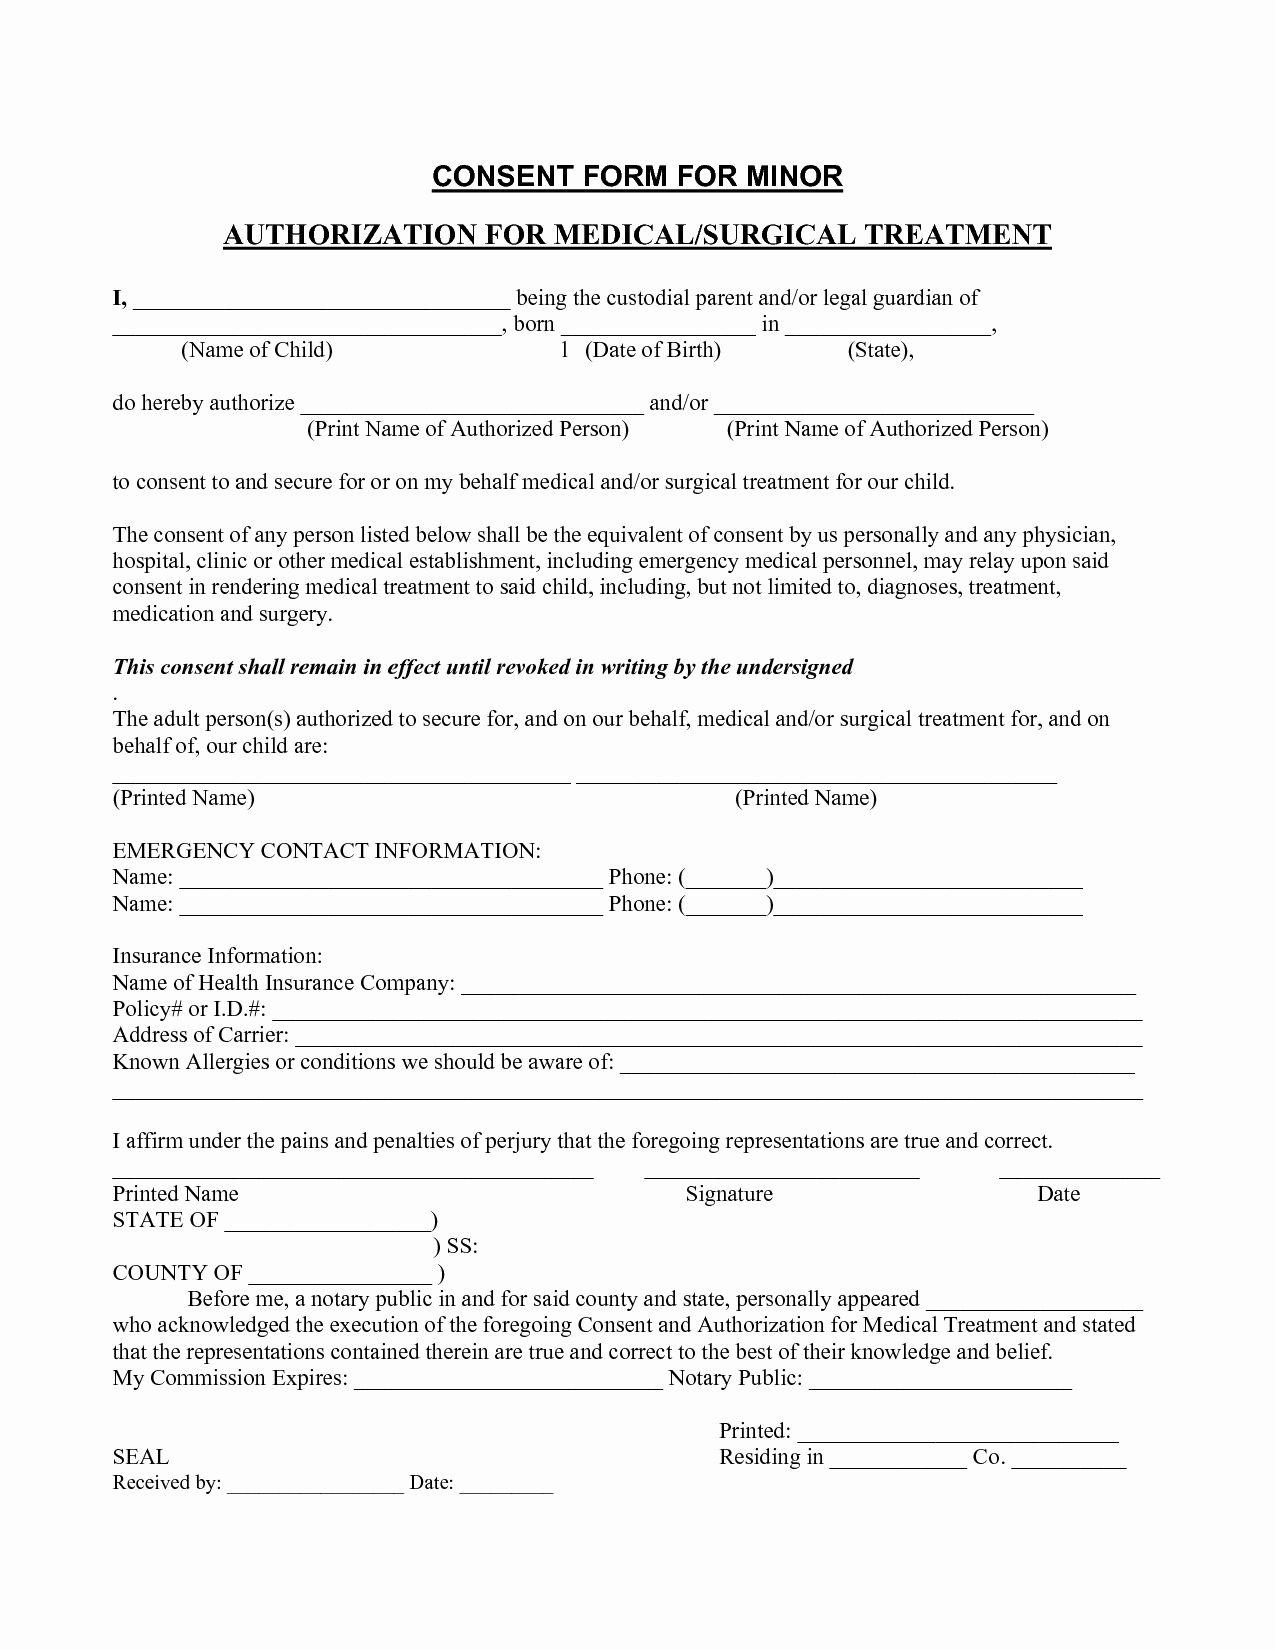 Medical Consent form Template Elegant Medical Consent form